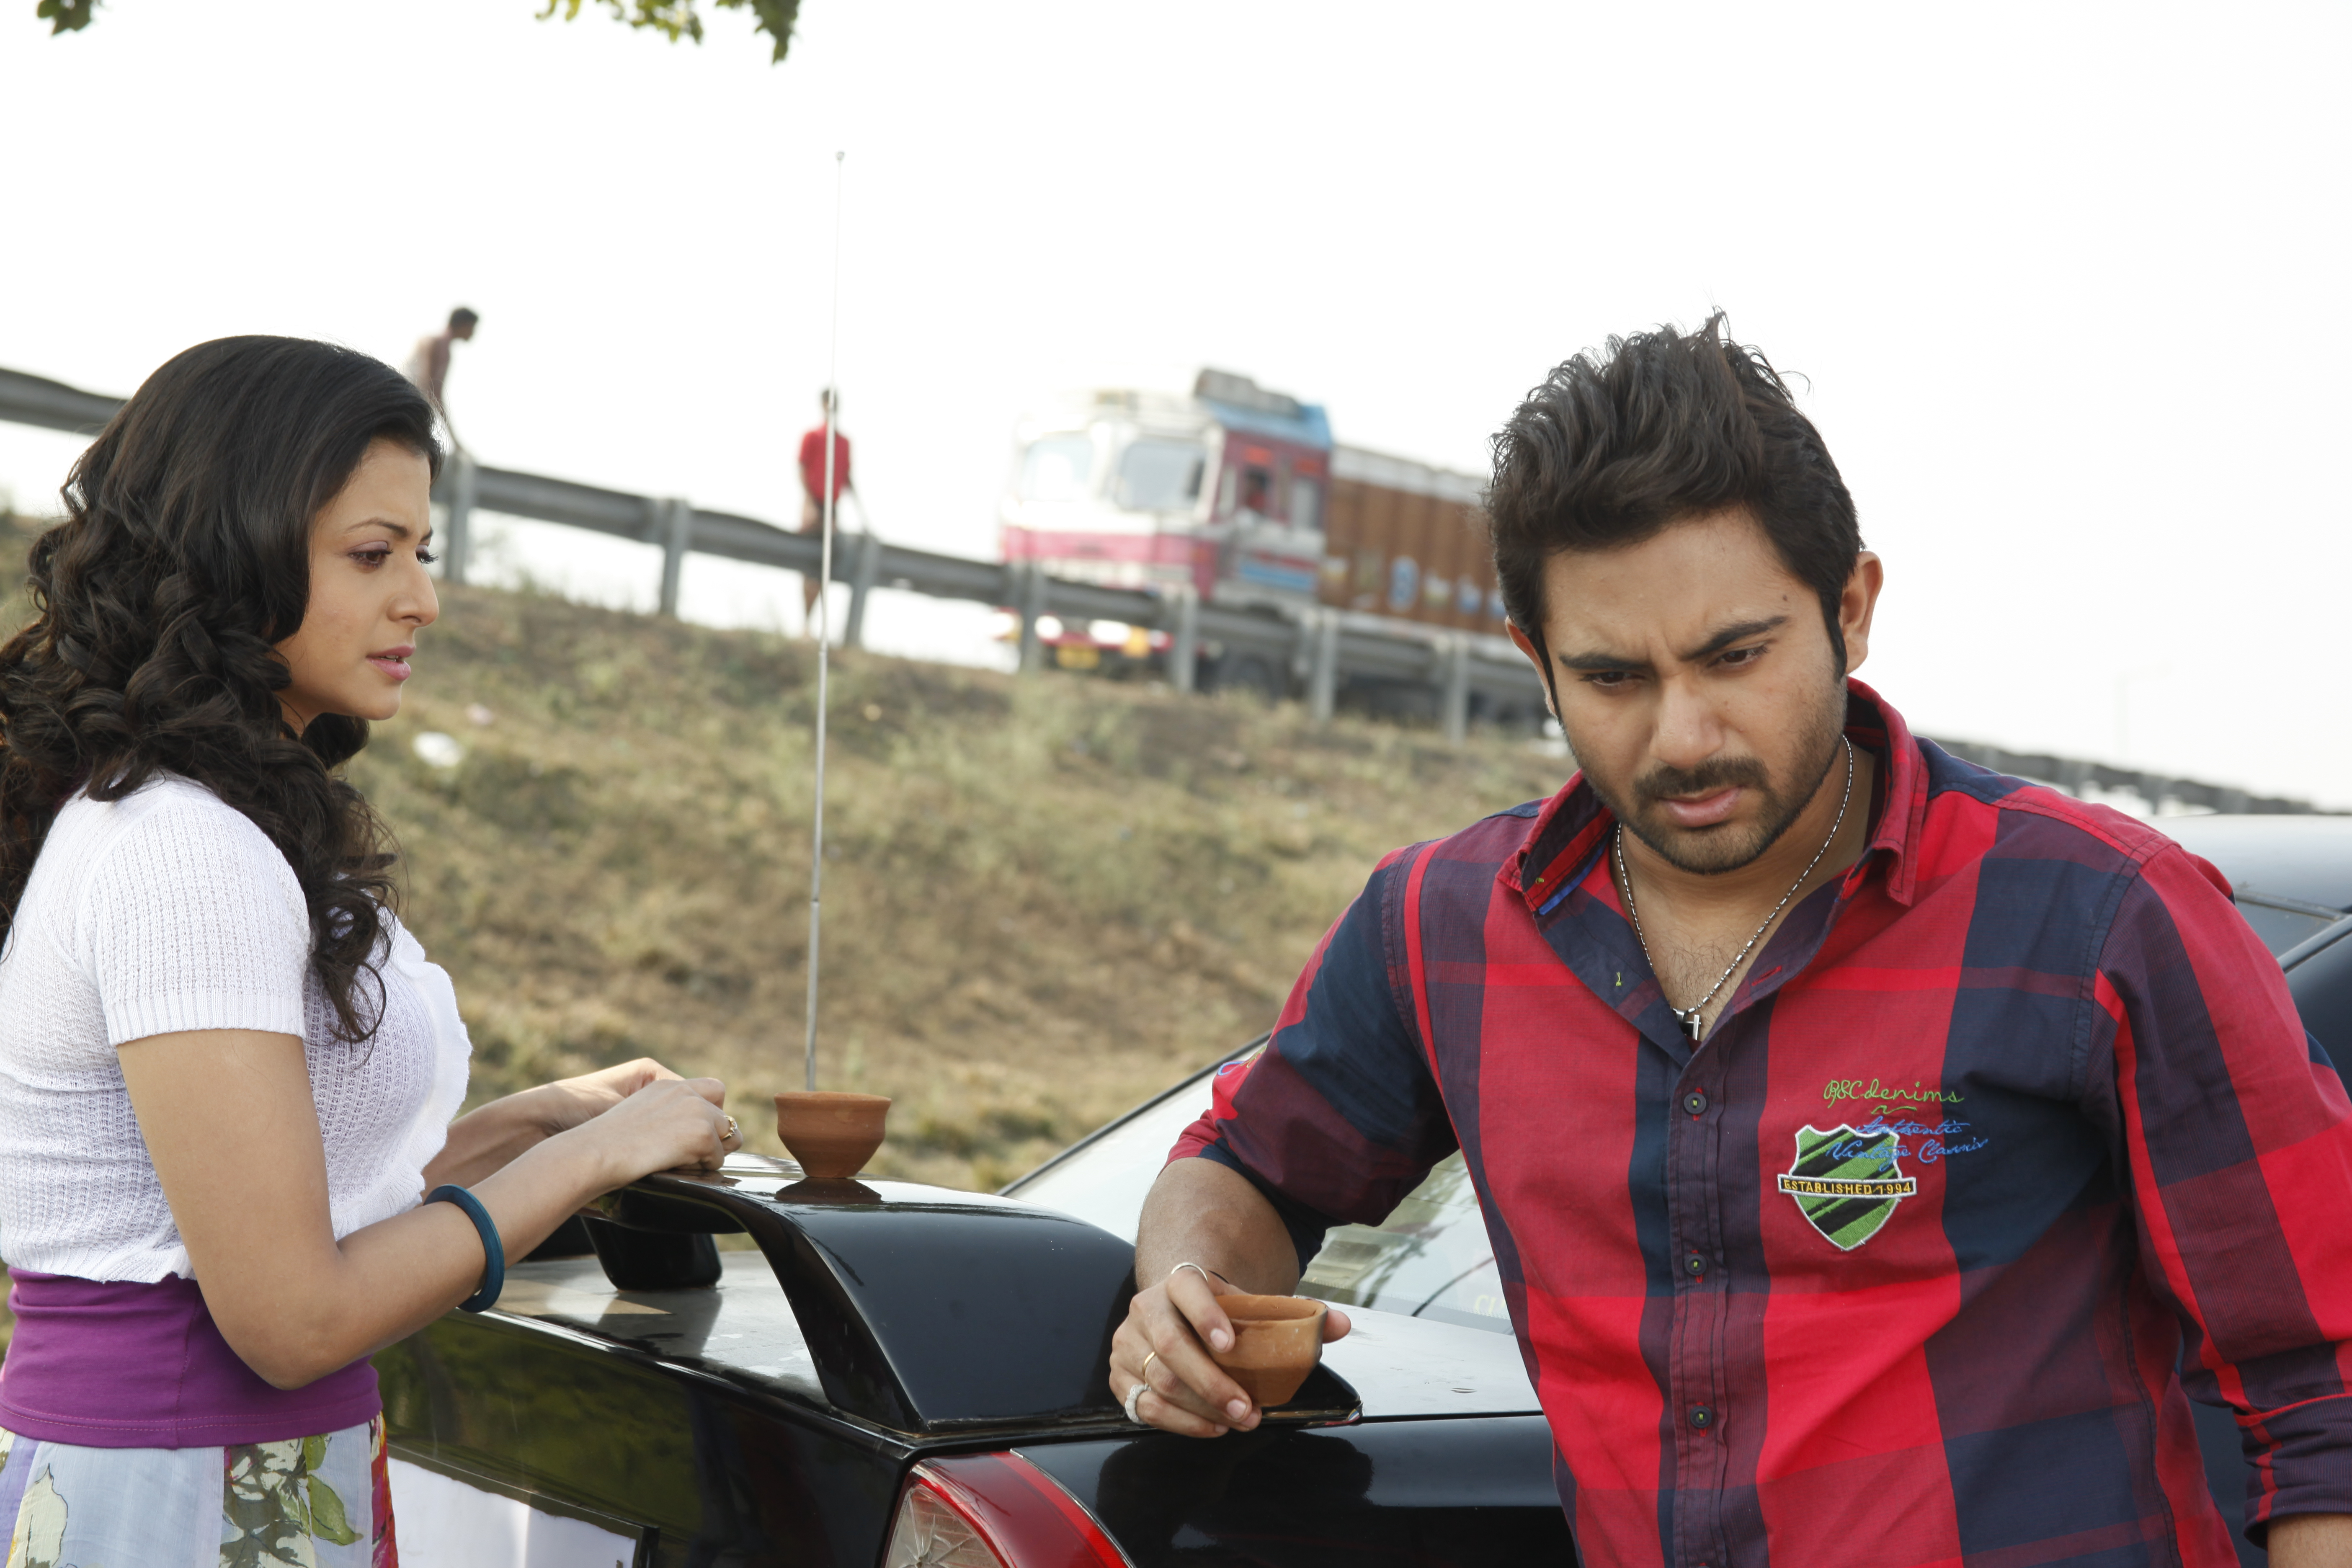 Soham Chakraborty and Koyel Mallick in Jaaneman (2012)